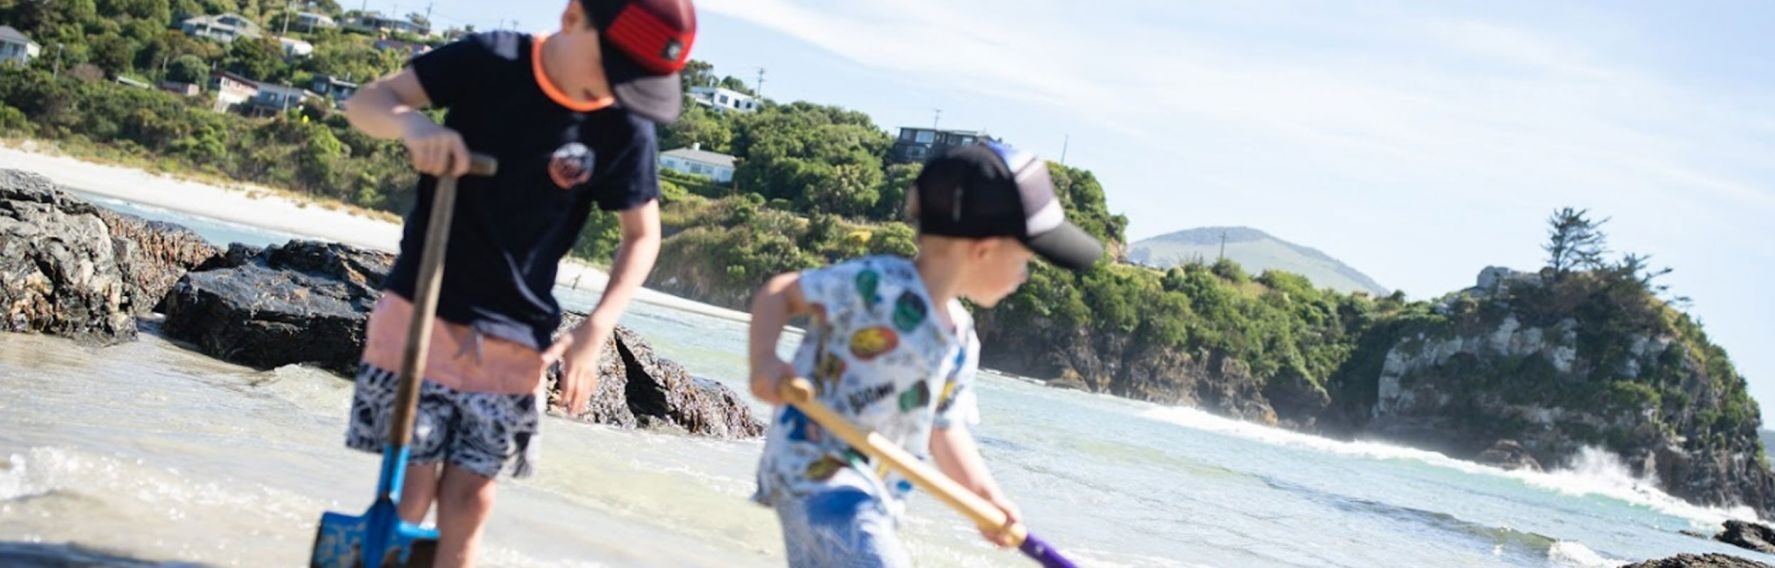 KIds playing on Brighton Beach